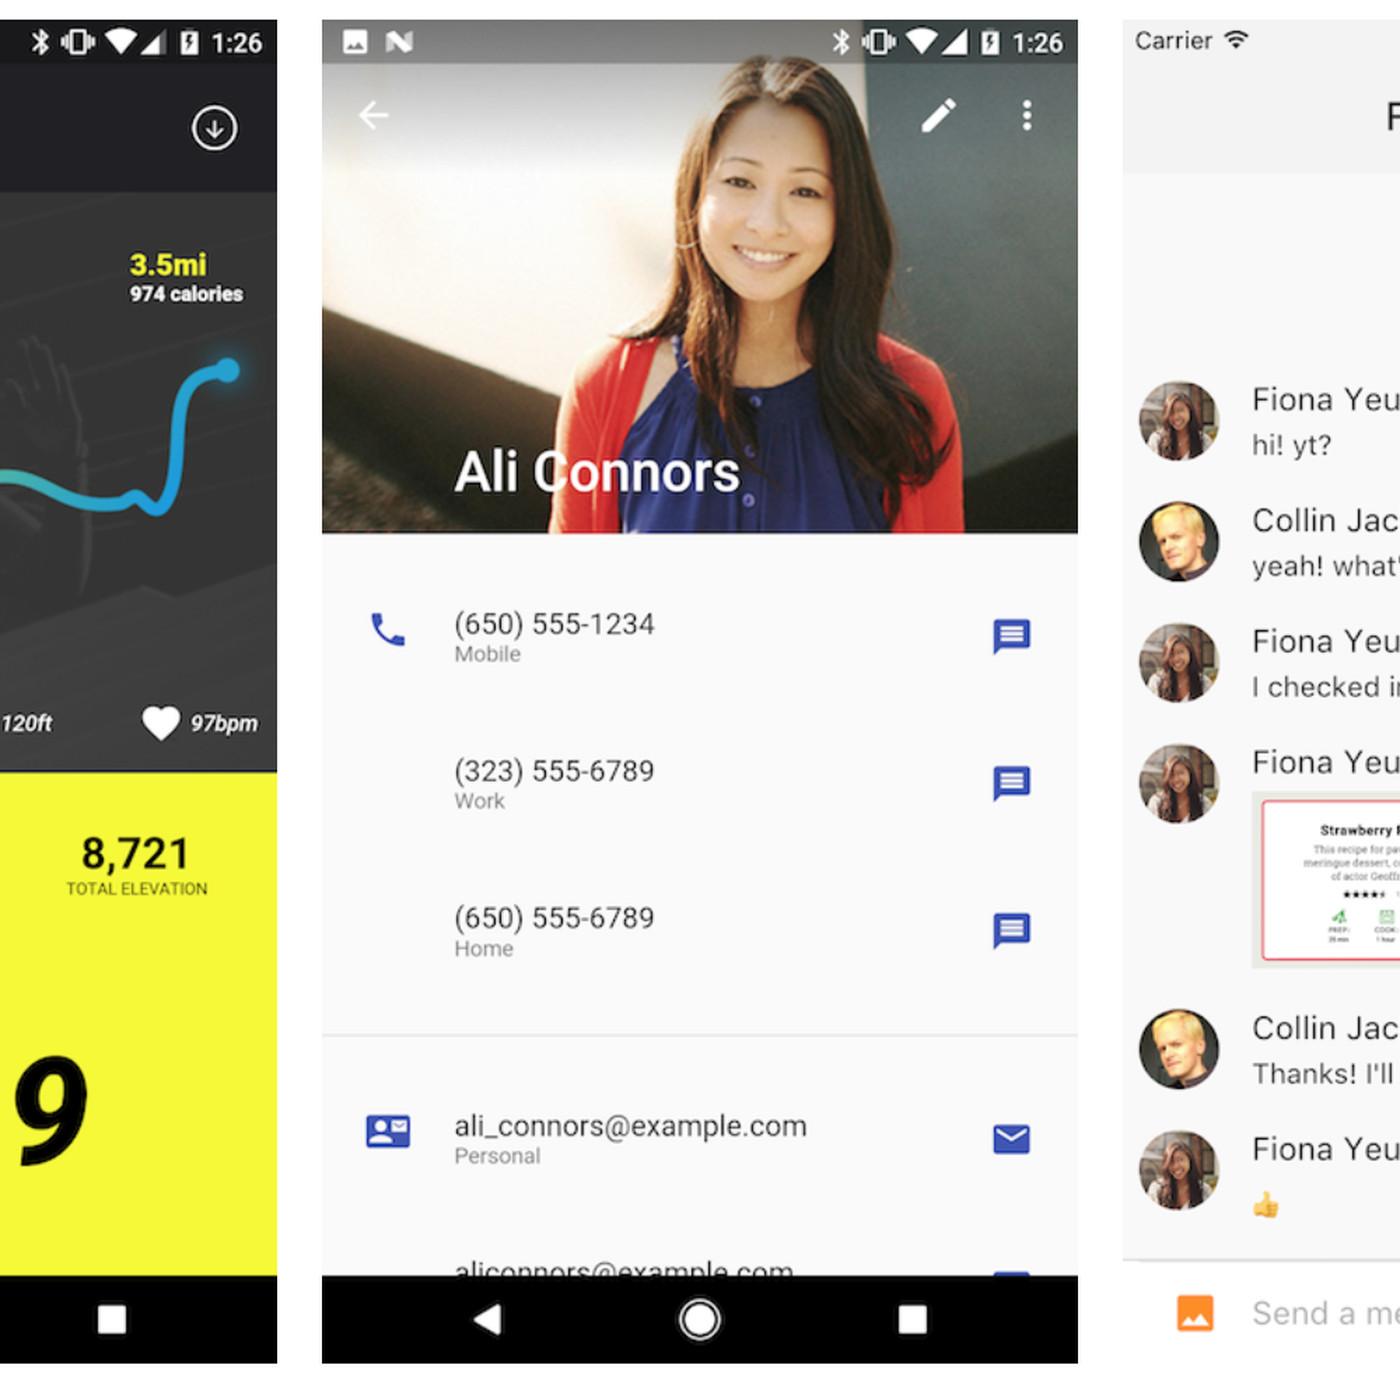 Google's Flutter app development framework is now in beta - The Verge